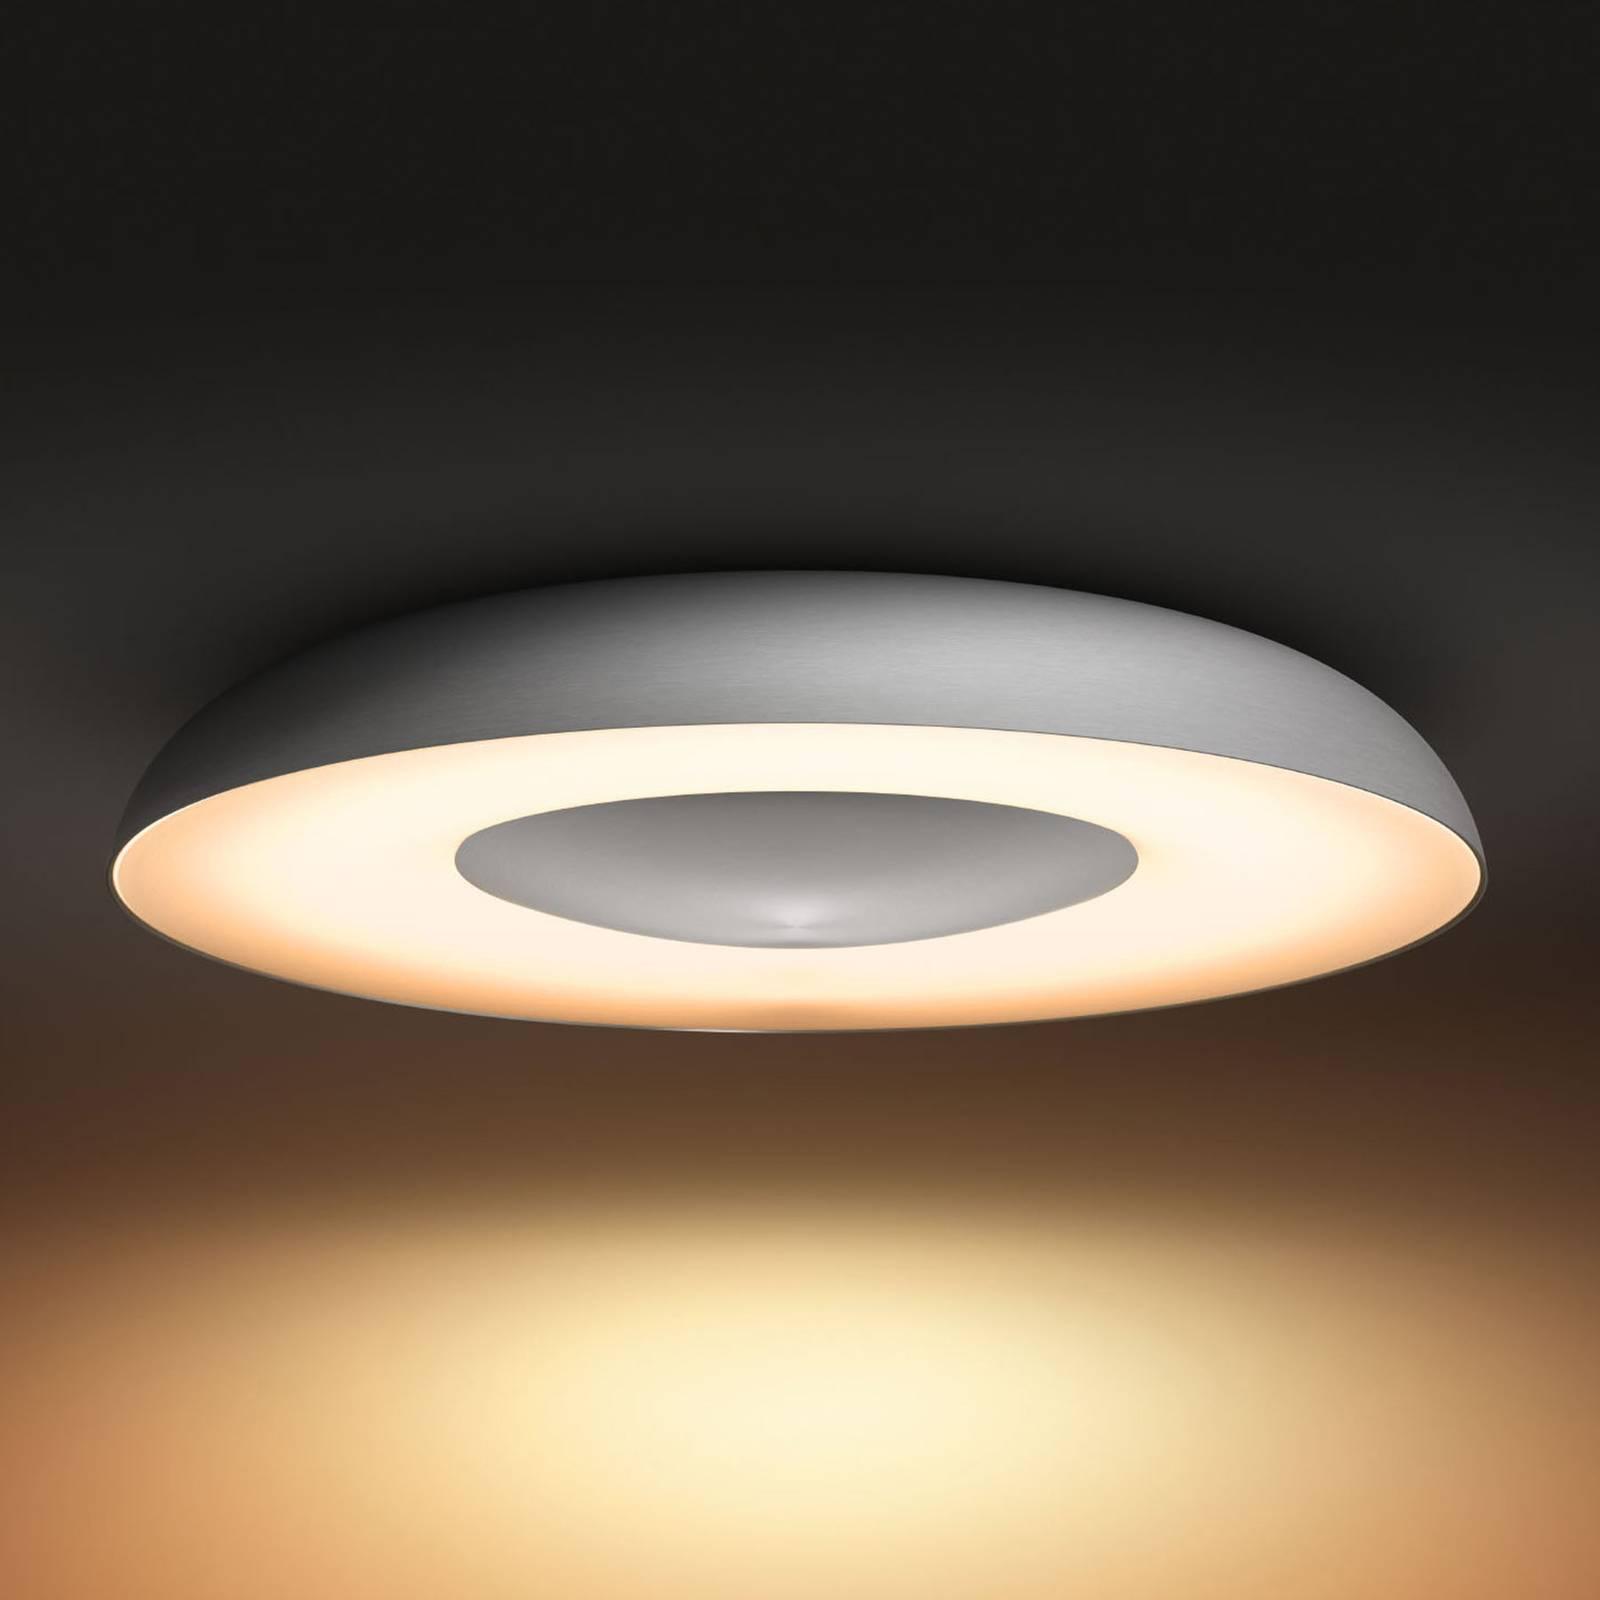 Philips Hue White Ambiance Still plafondlamp alu